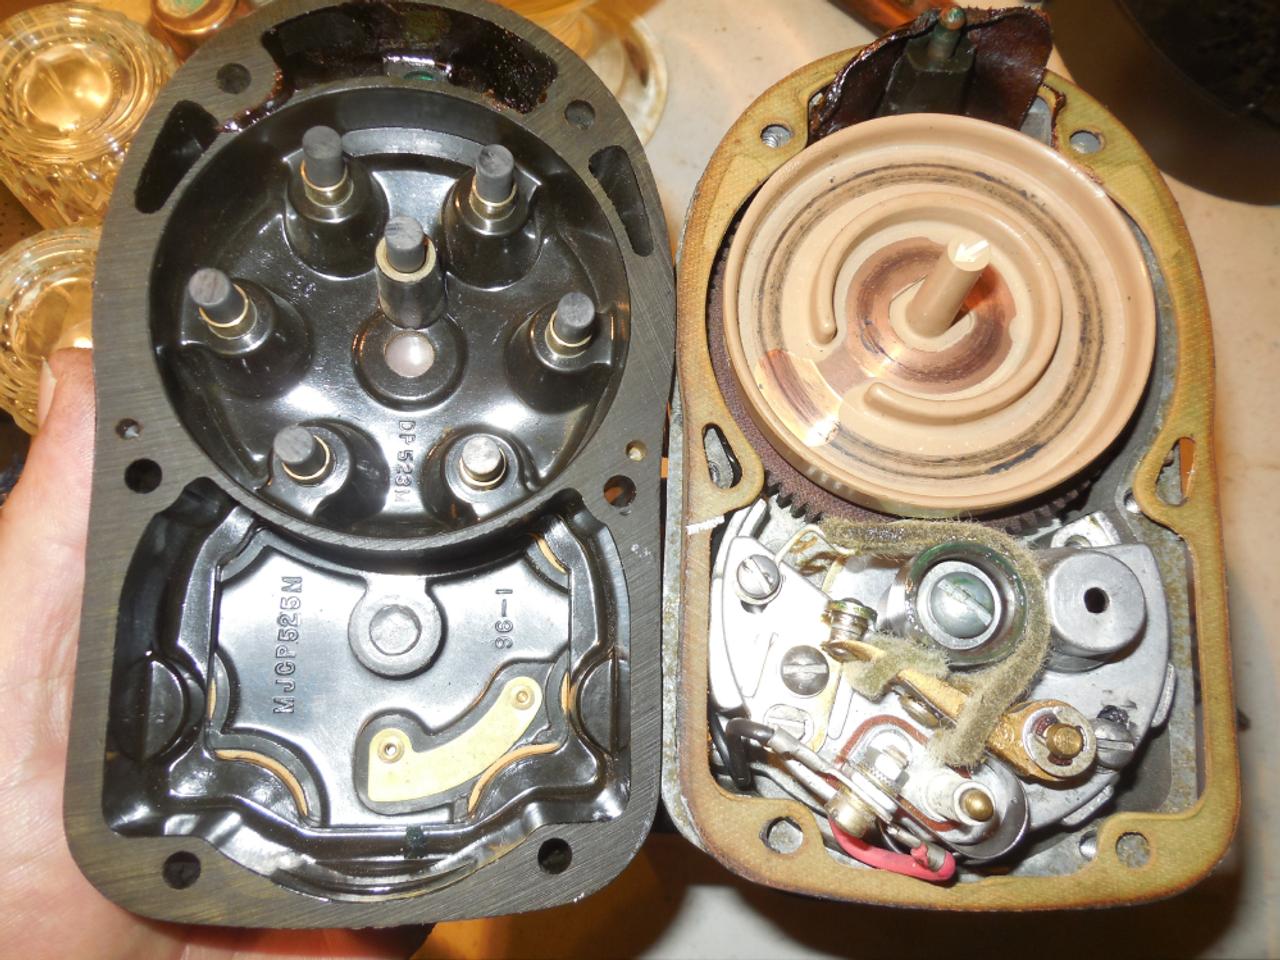 American Bosch MRF6A301 CCW Magneto Waukesha